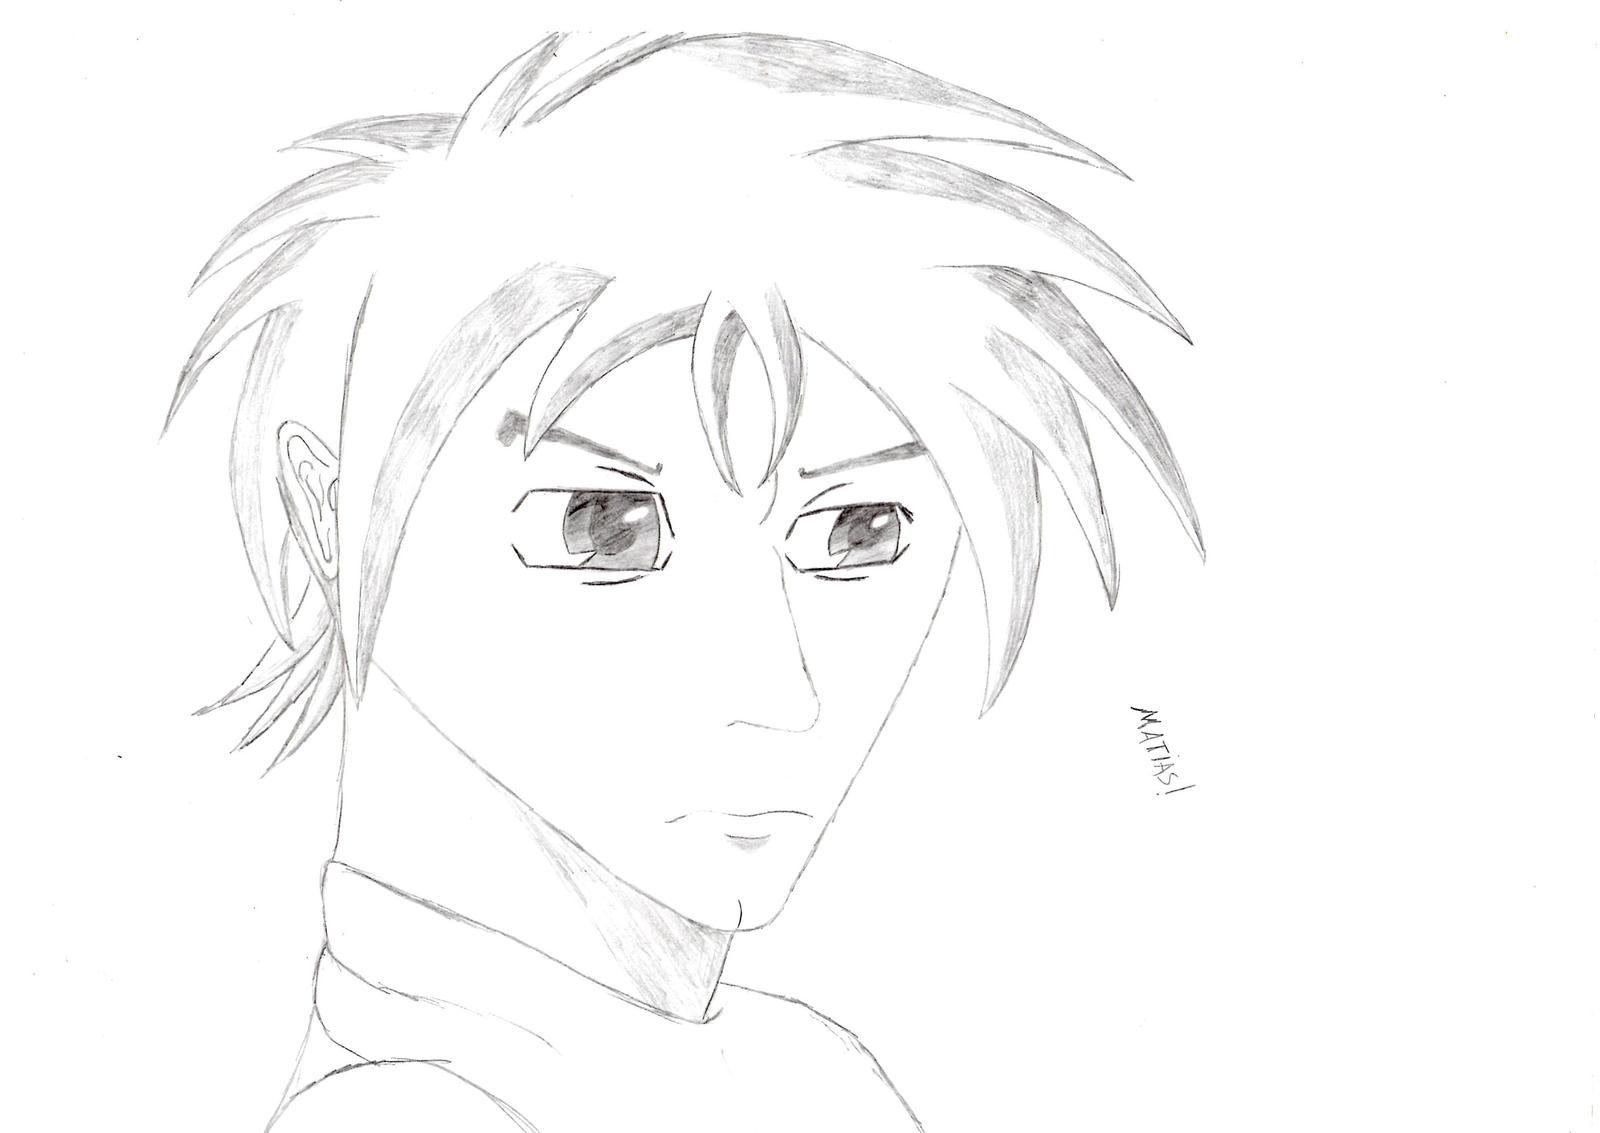 Anime boy drawing by friedrichengelh on deviantart